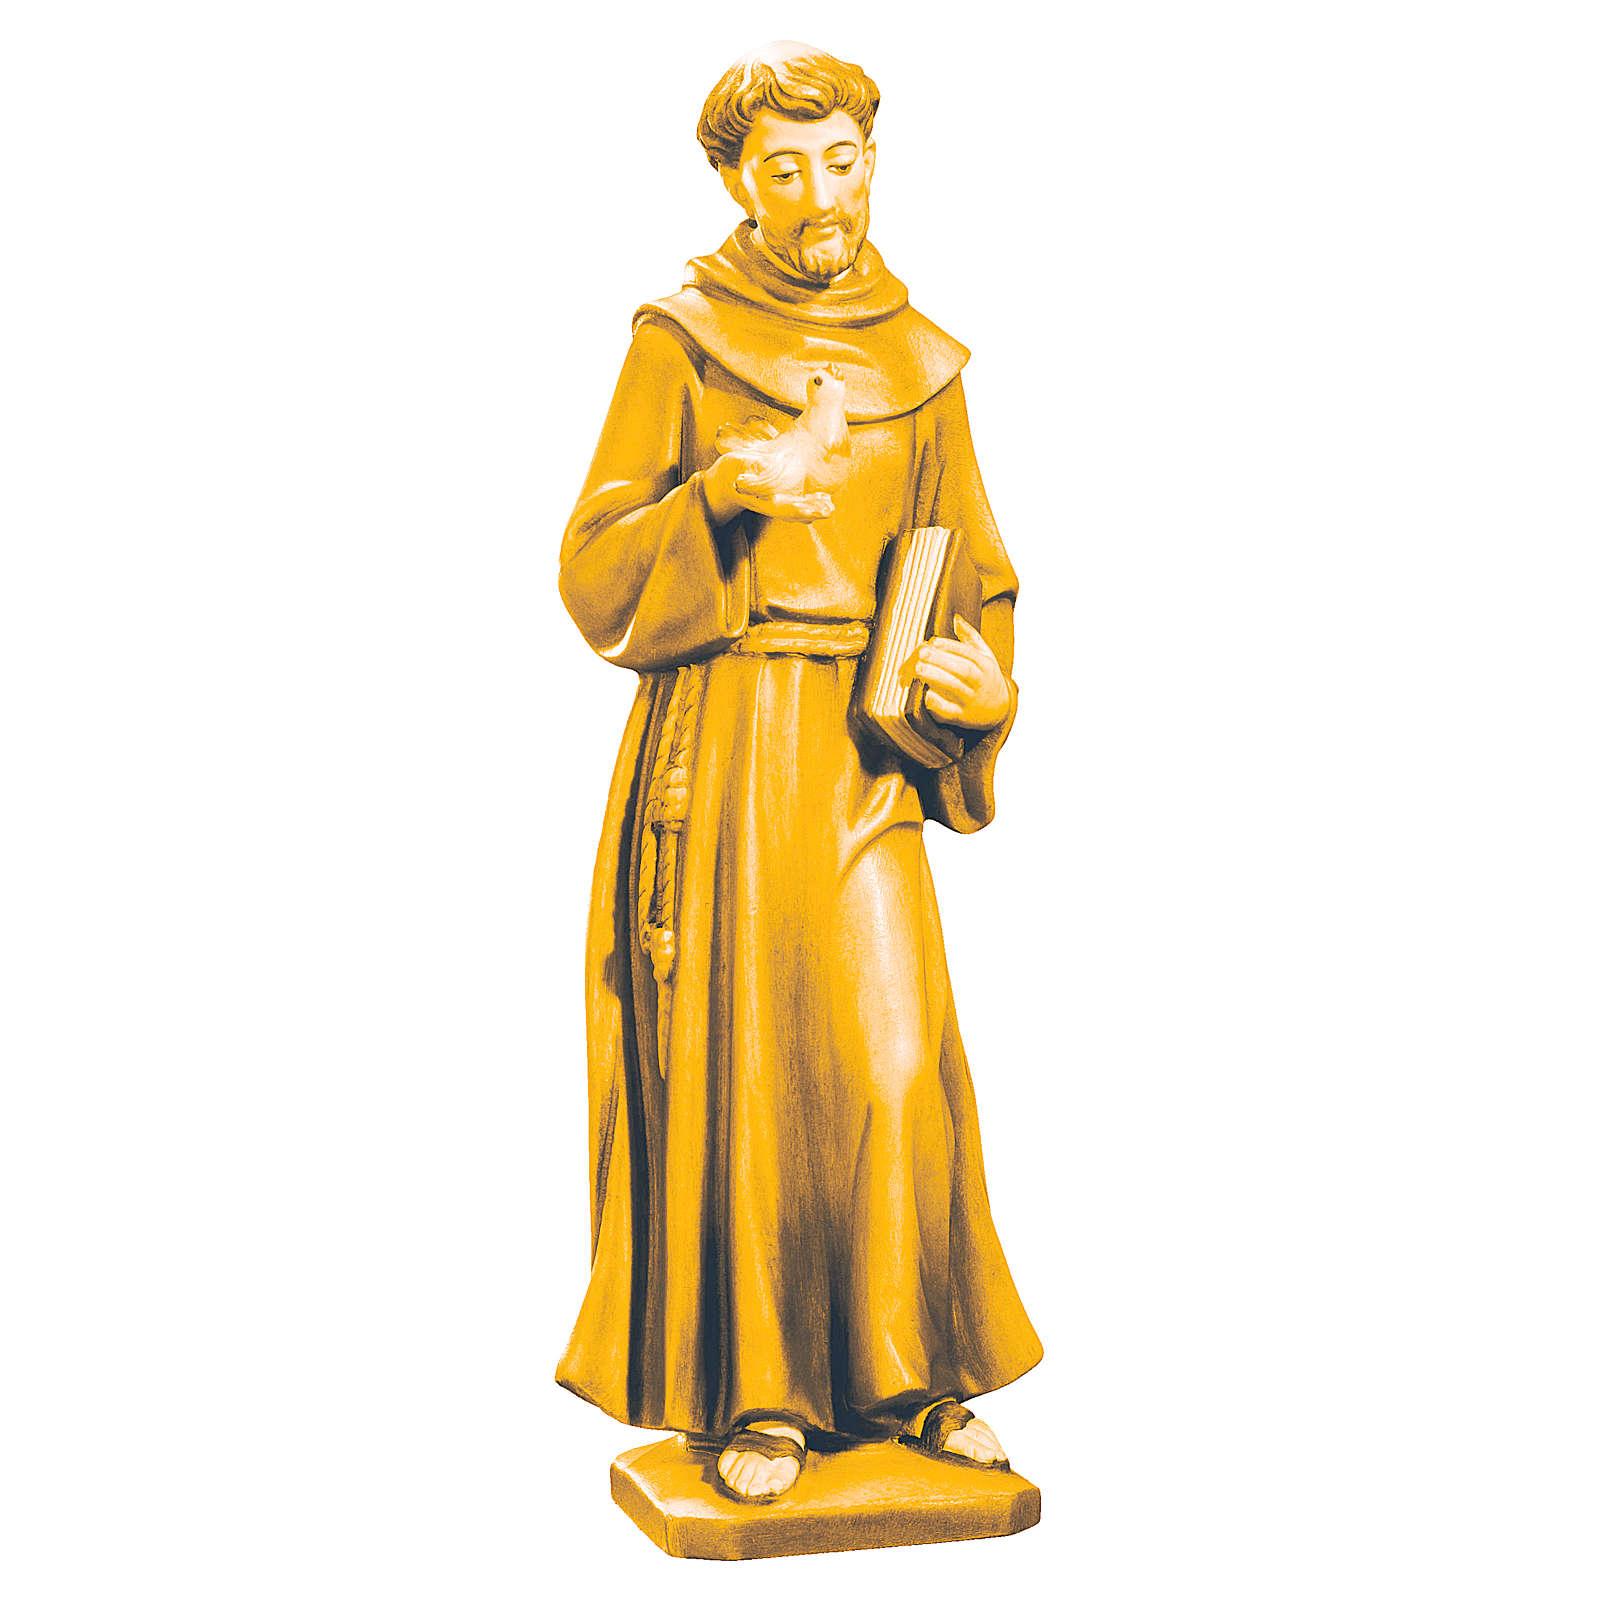 Estatua San Francisco de madera, acabado con diferentes matices de marrón 4